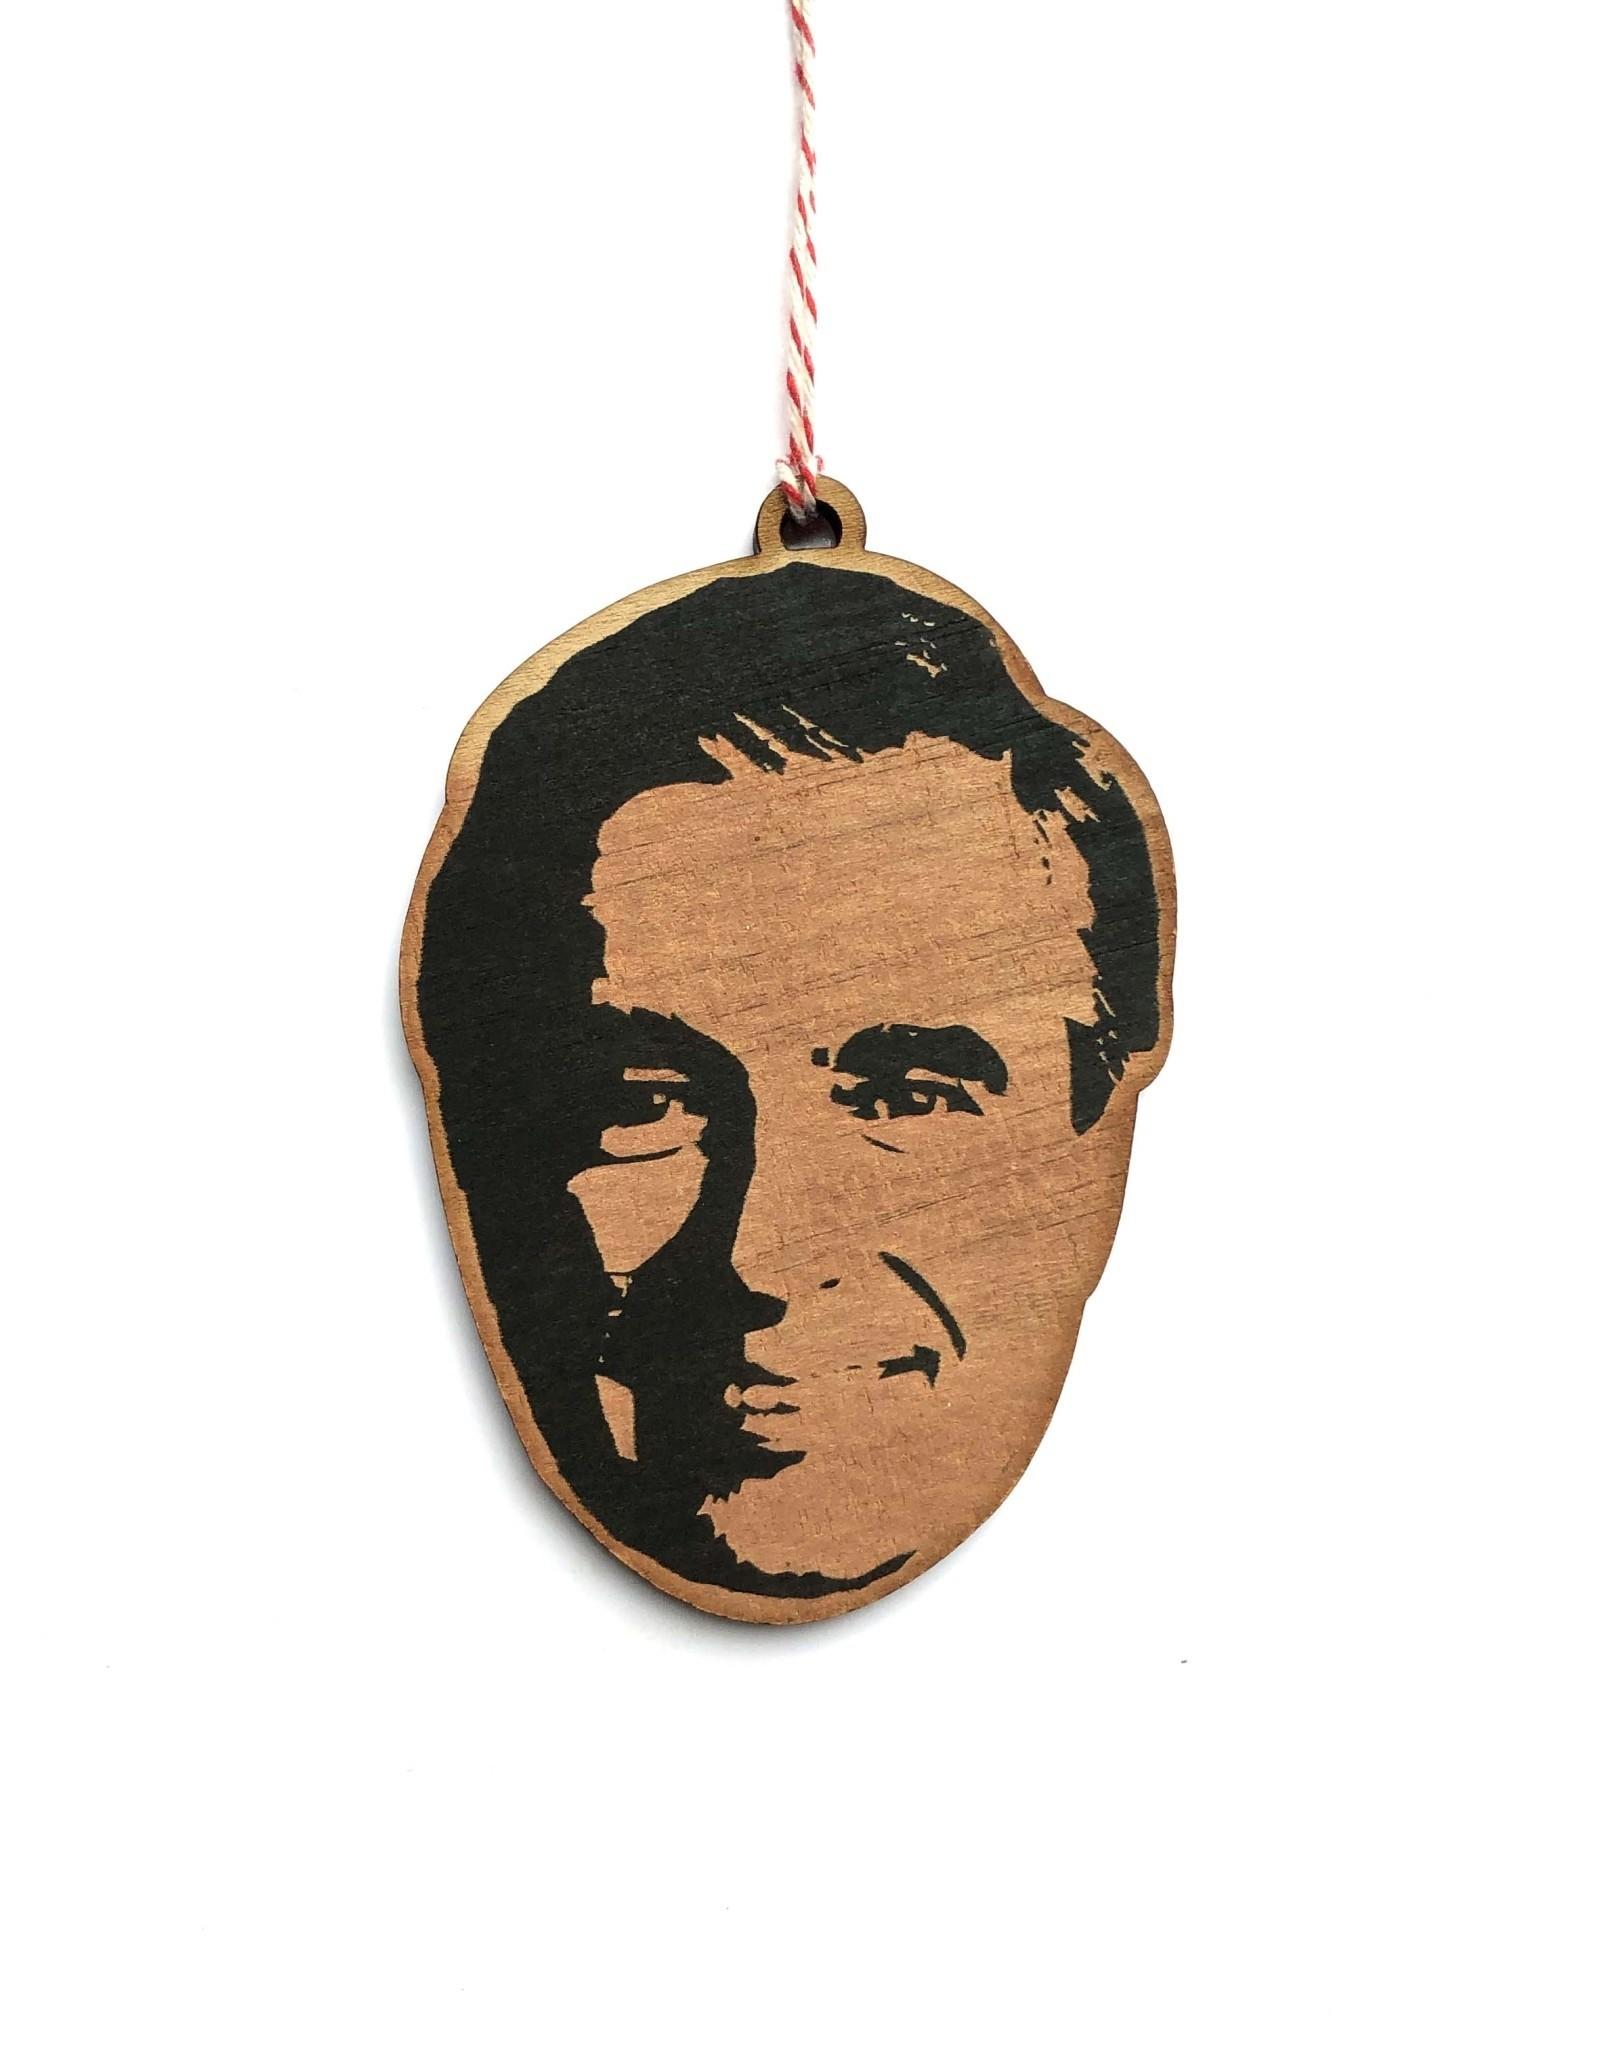 Mr. Rogers Wooden Ornament